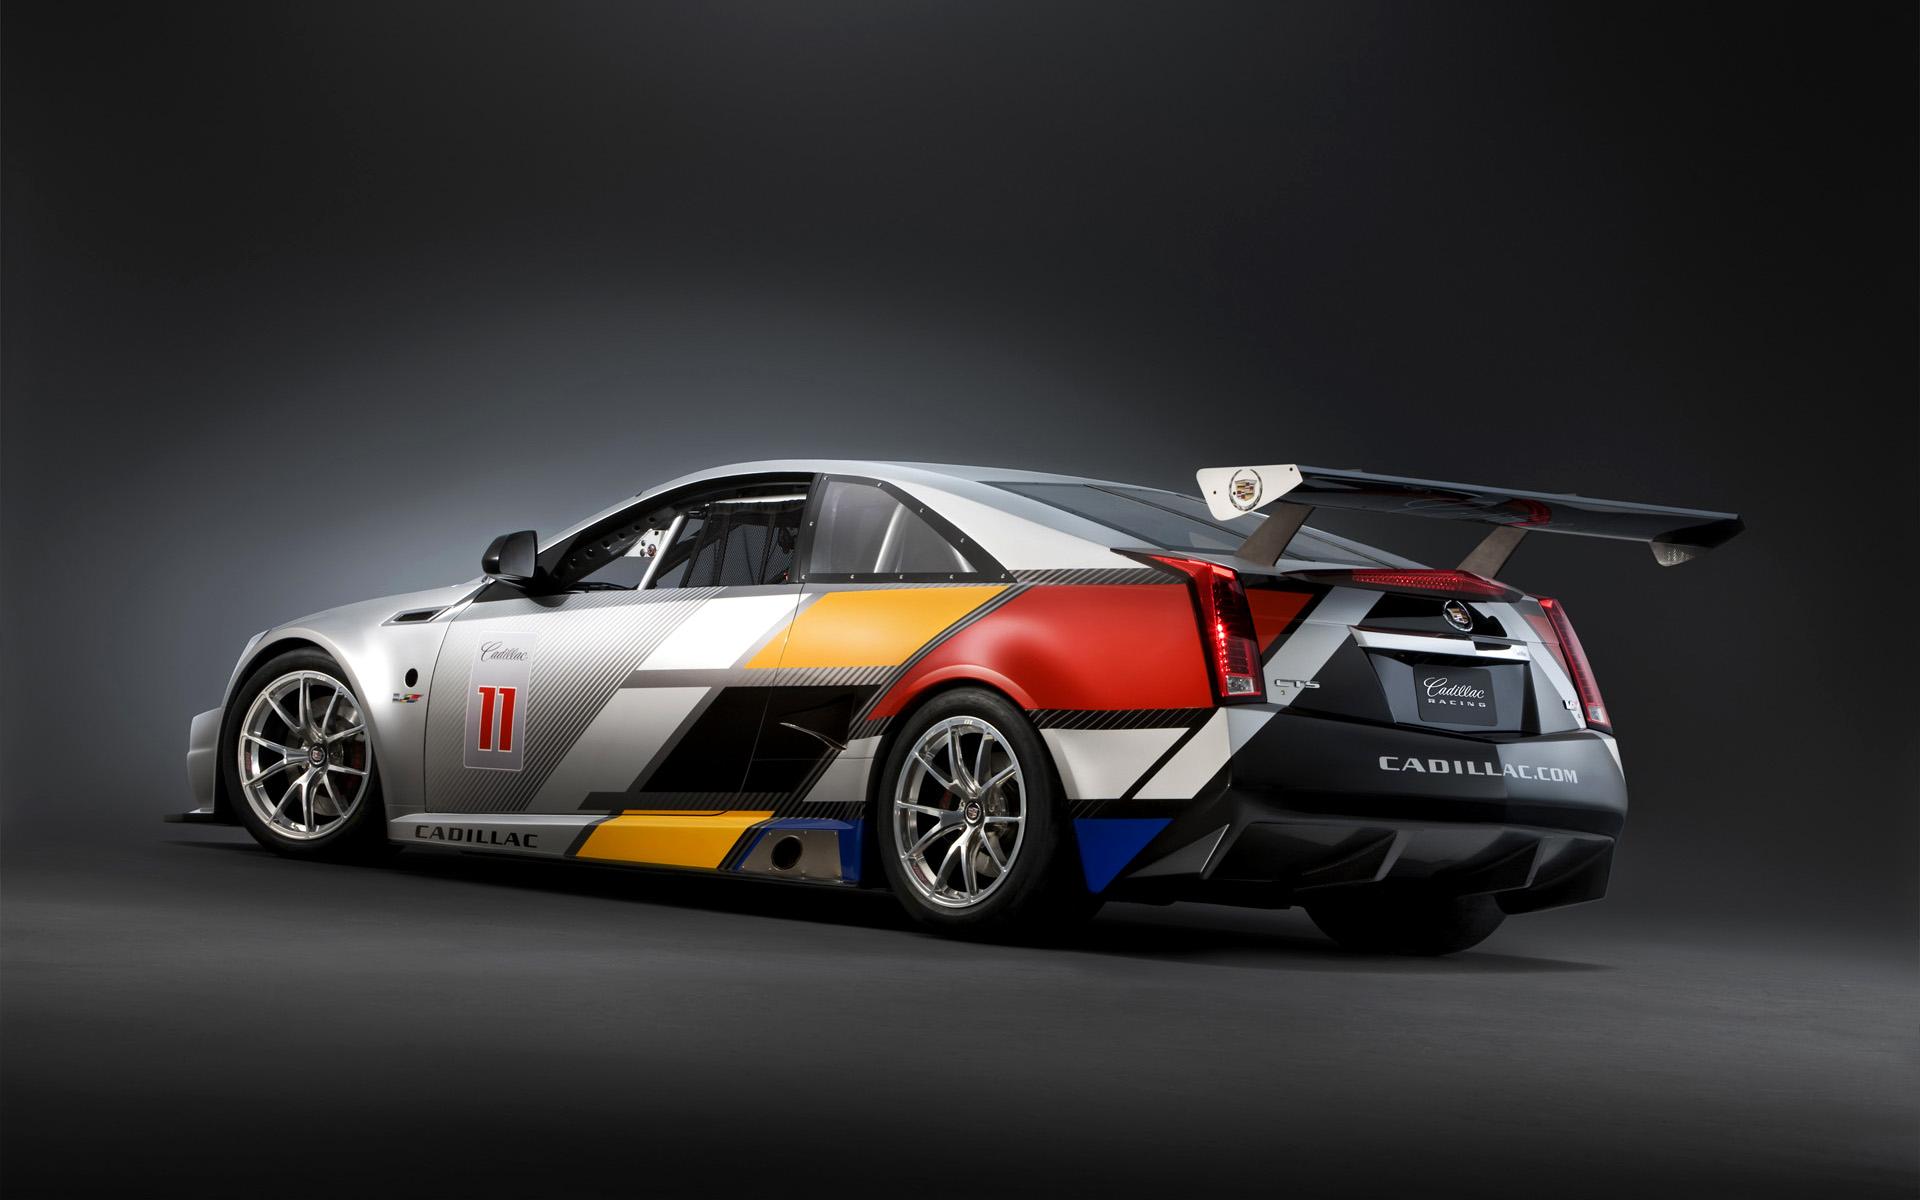 2011 Cadillac CTS V Coupe Racecar race cars q wallpaper 1920x1200 1920x1200